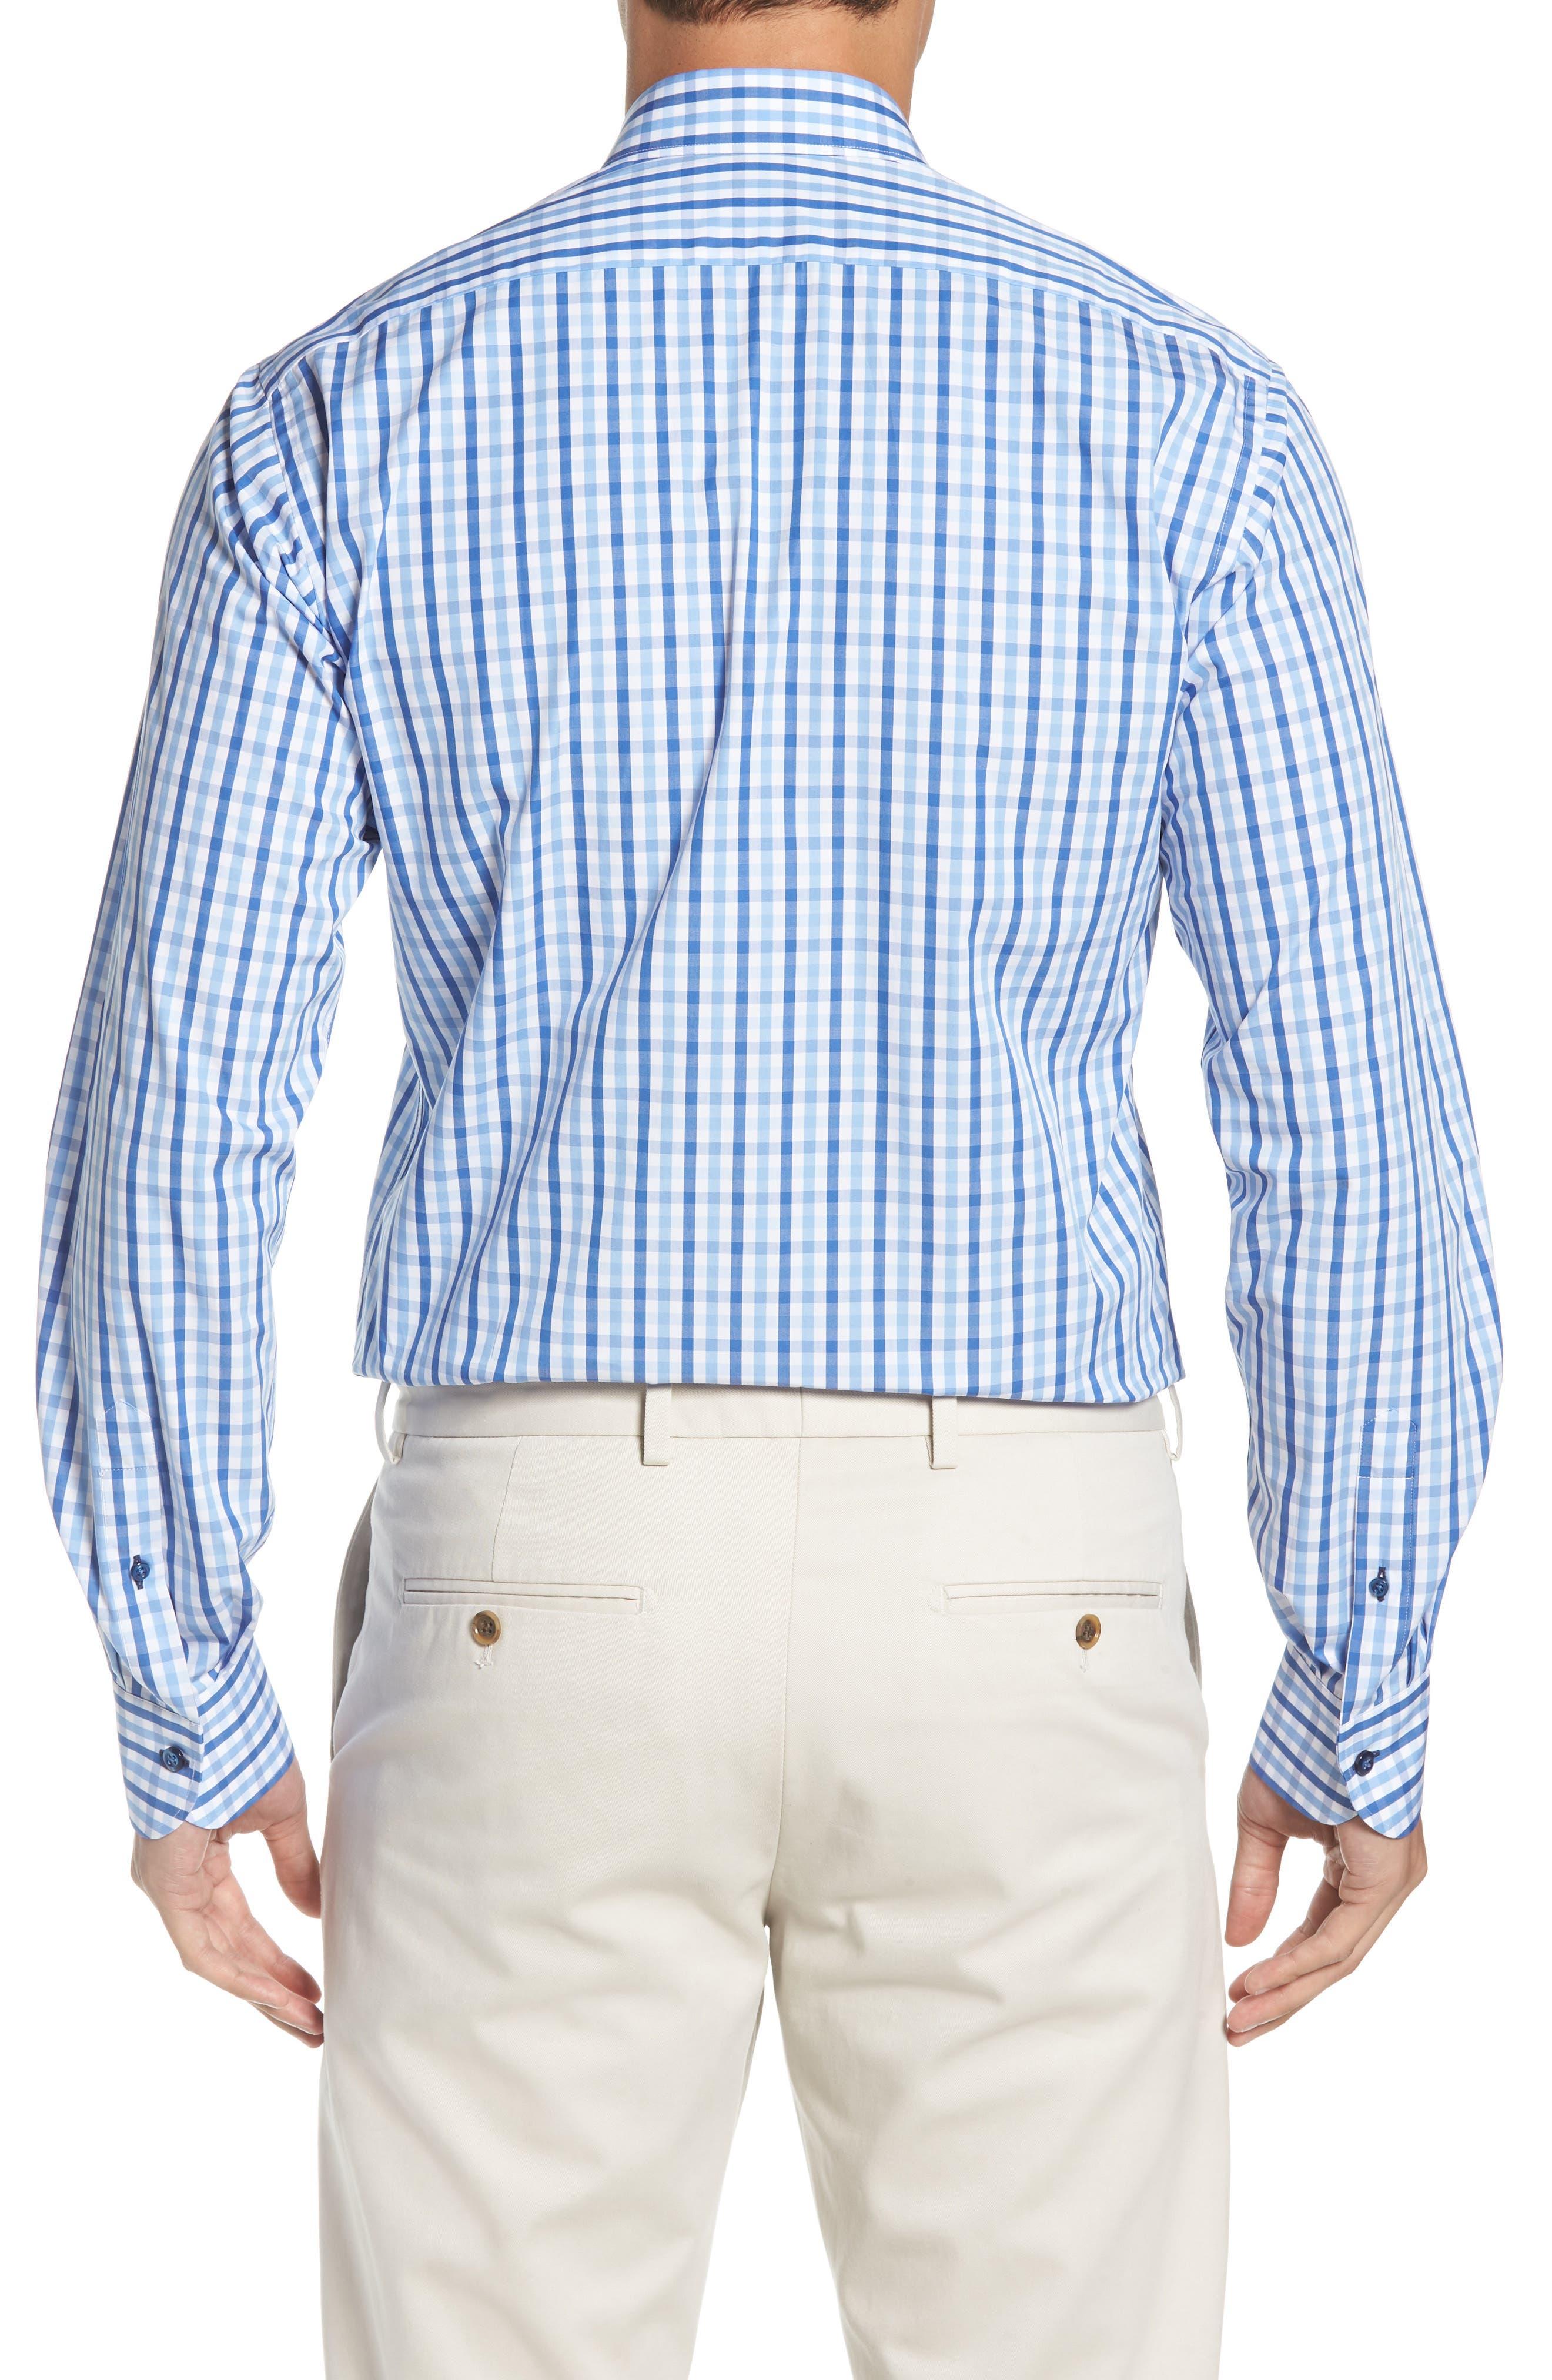 Regular Fit Check Dress Shirt,                             Alternate thumbnail 3, color,                             BLUE